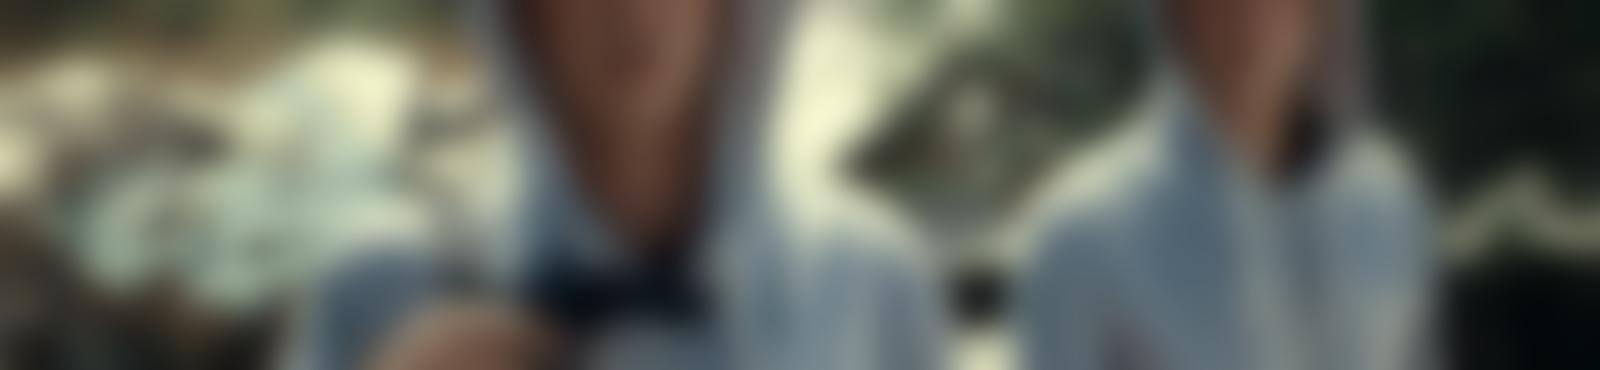 Blurred 670606d2 c968 4eba b9e1 e7693218b73f